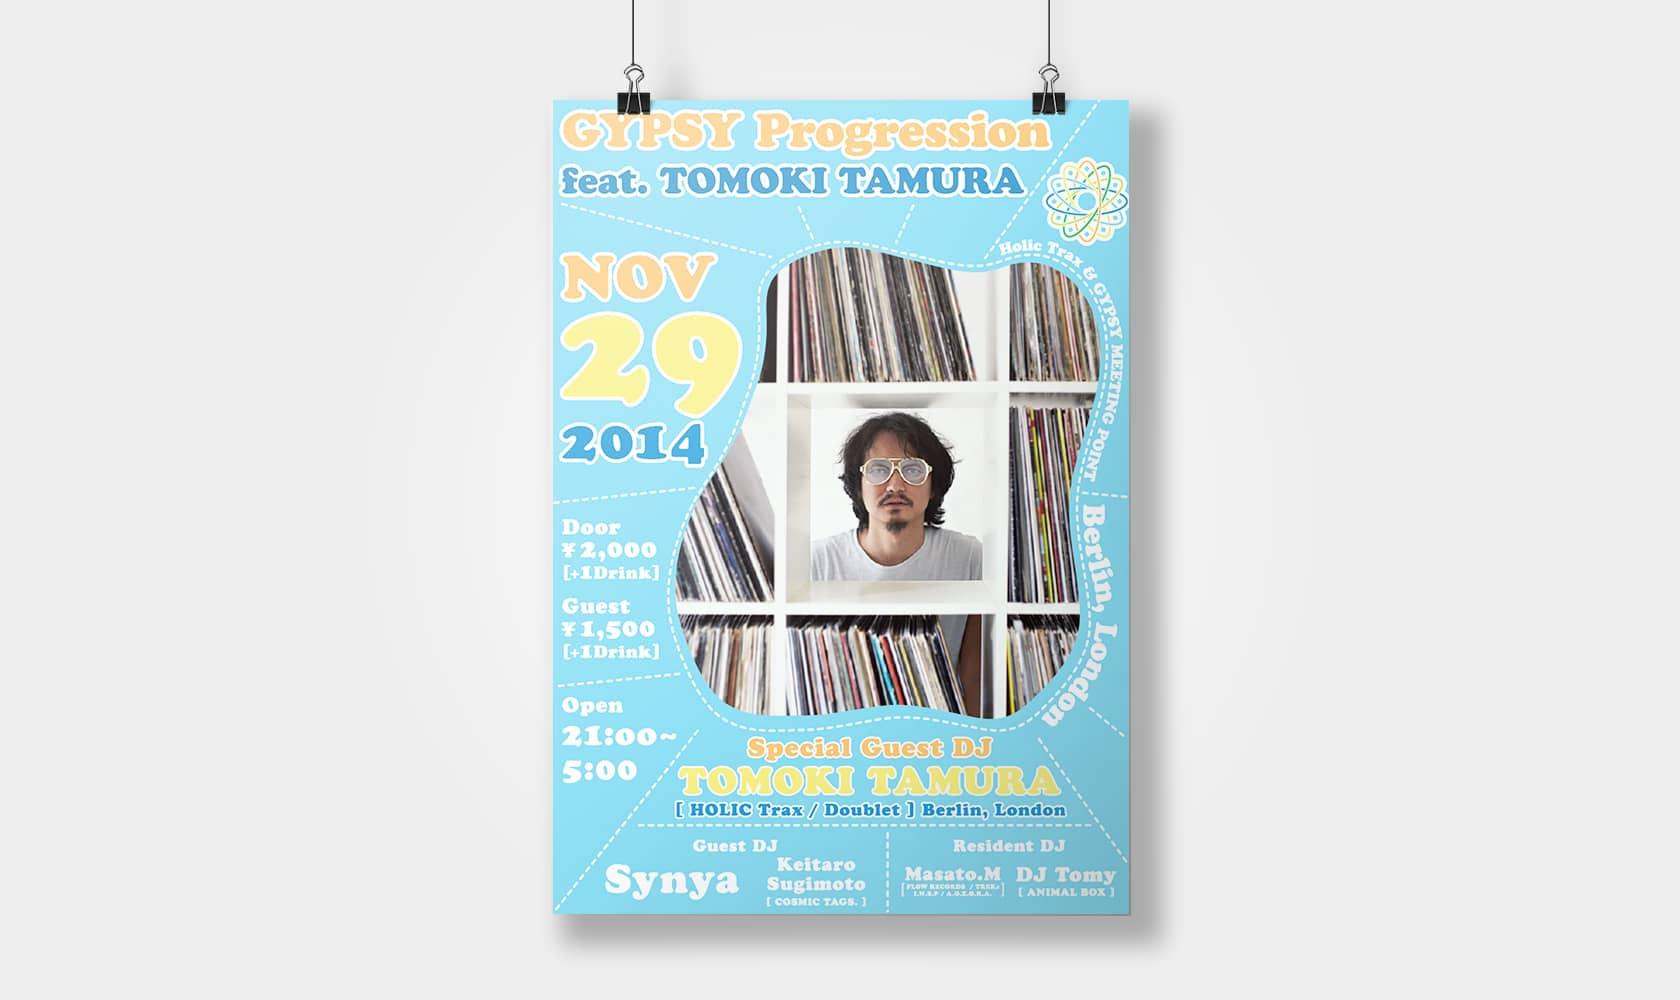 GYPSY PROGRESSION feat. Tomoki Tamura 2014/11/29